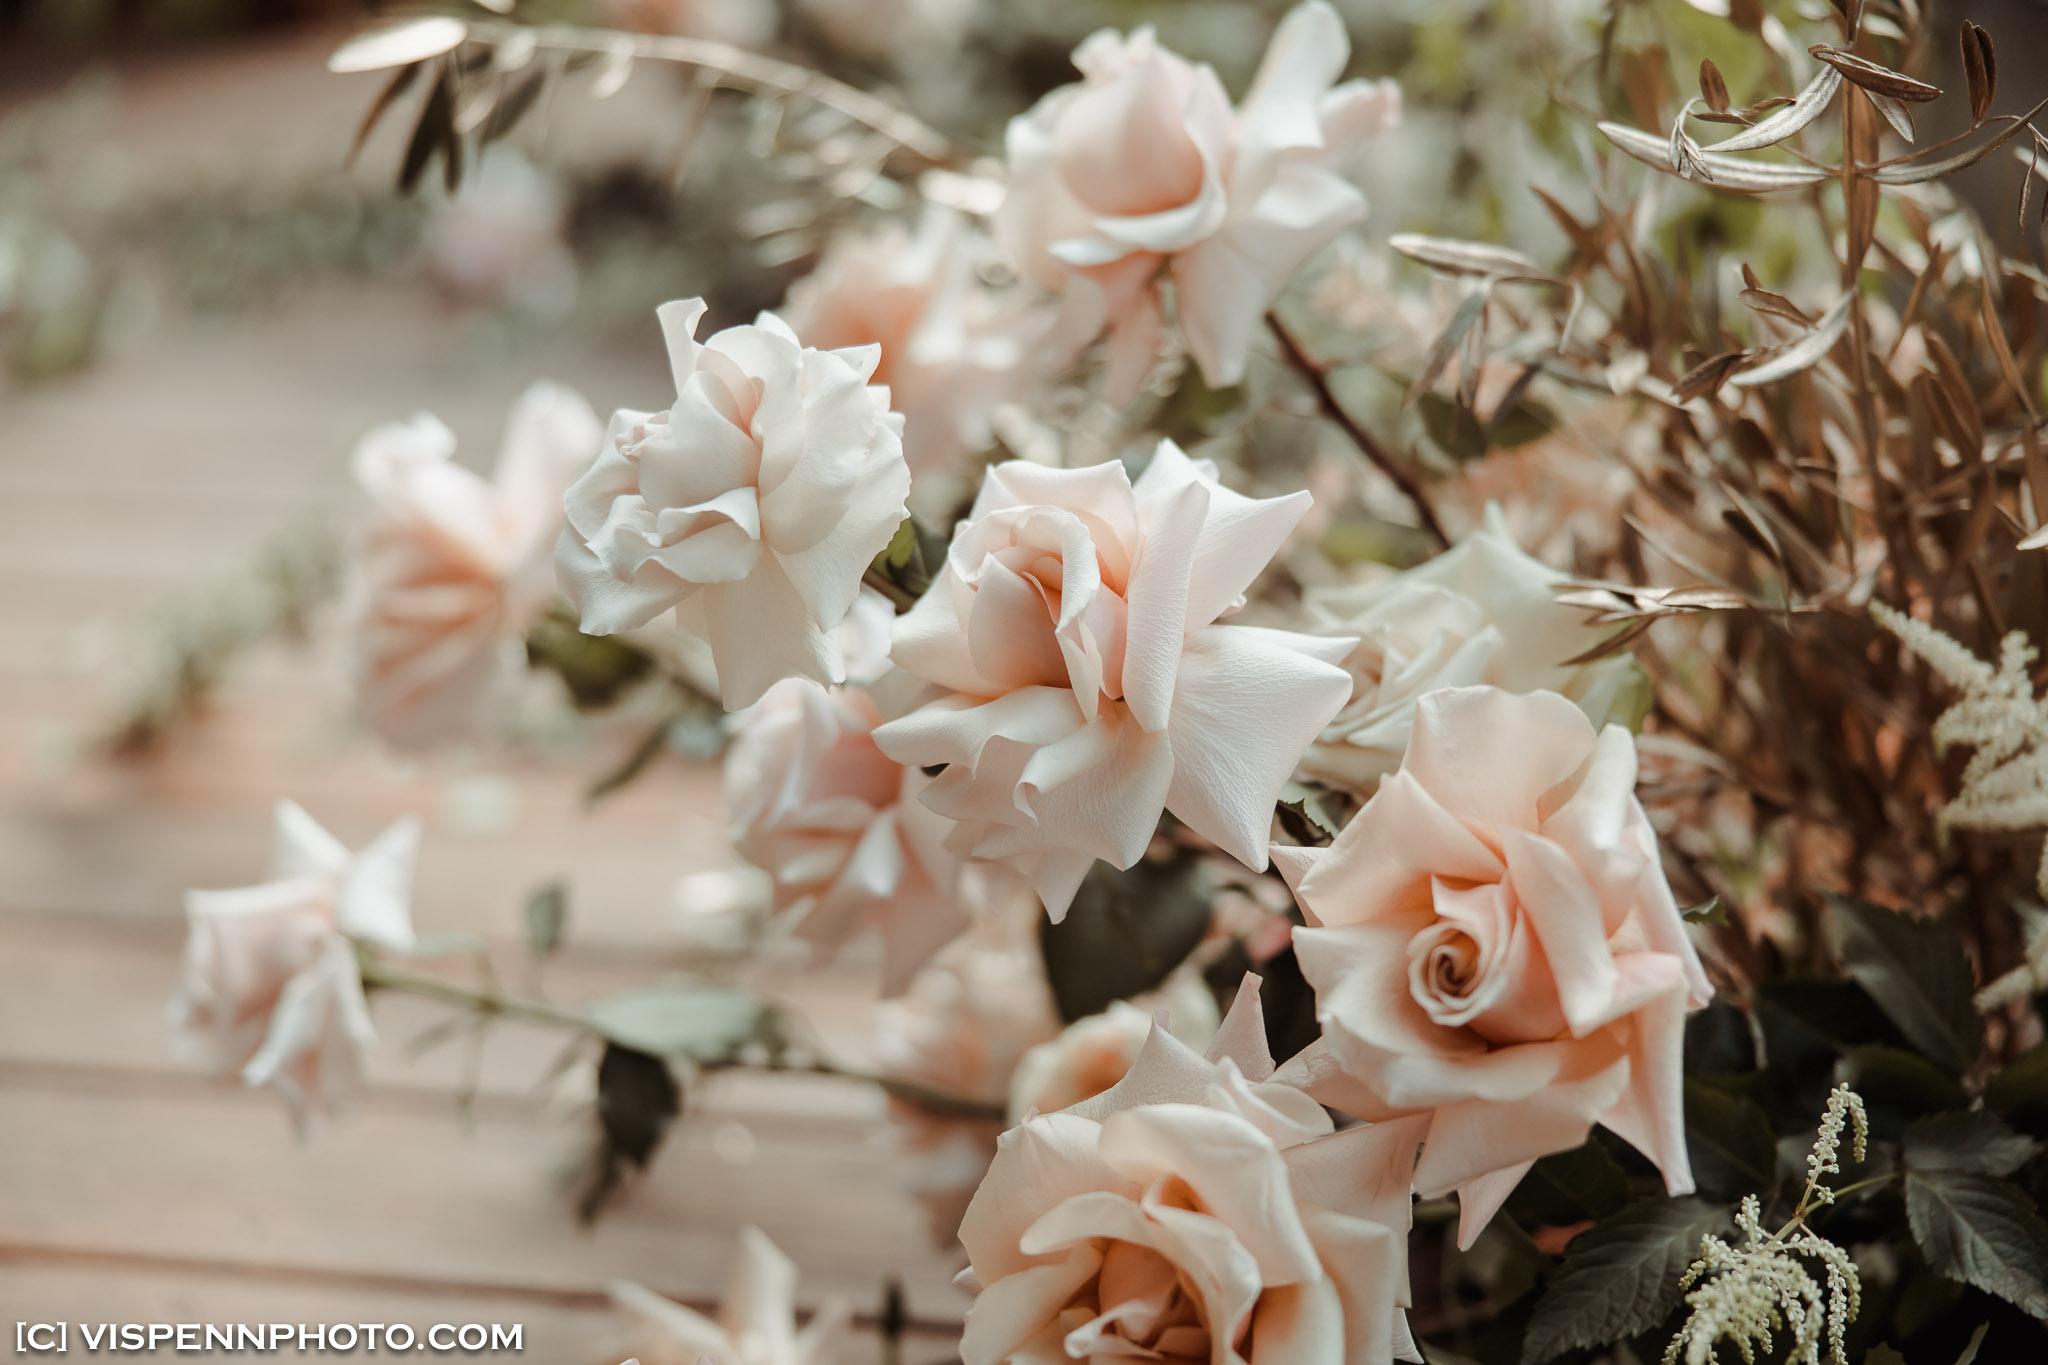 WEDDING DAY Photography Melbourne ElitaPB 06769 1P EOSR ZHPENN